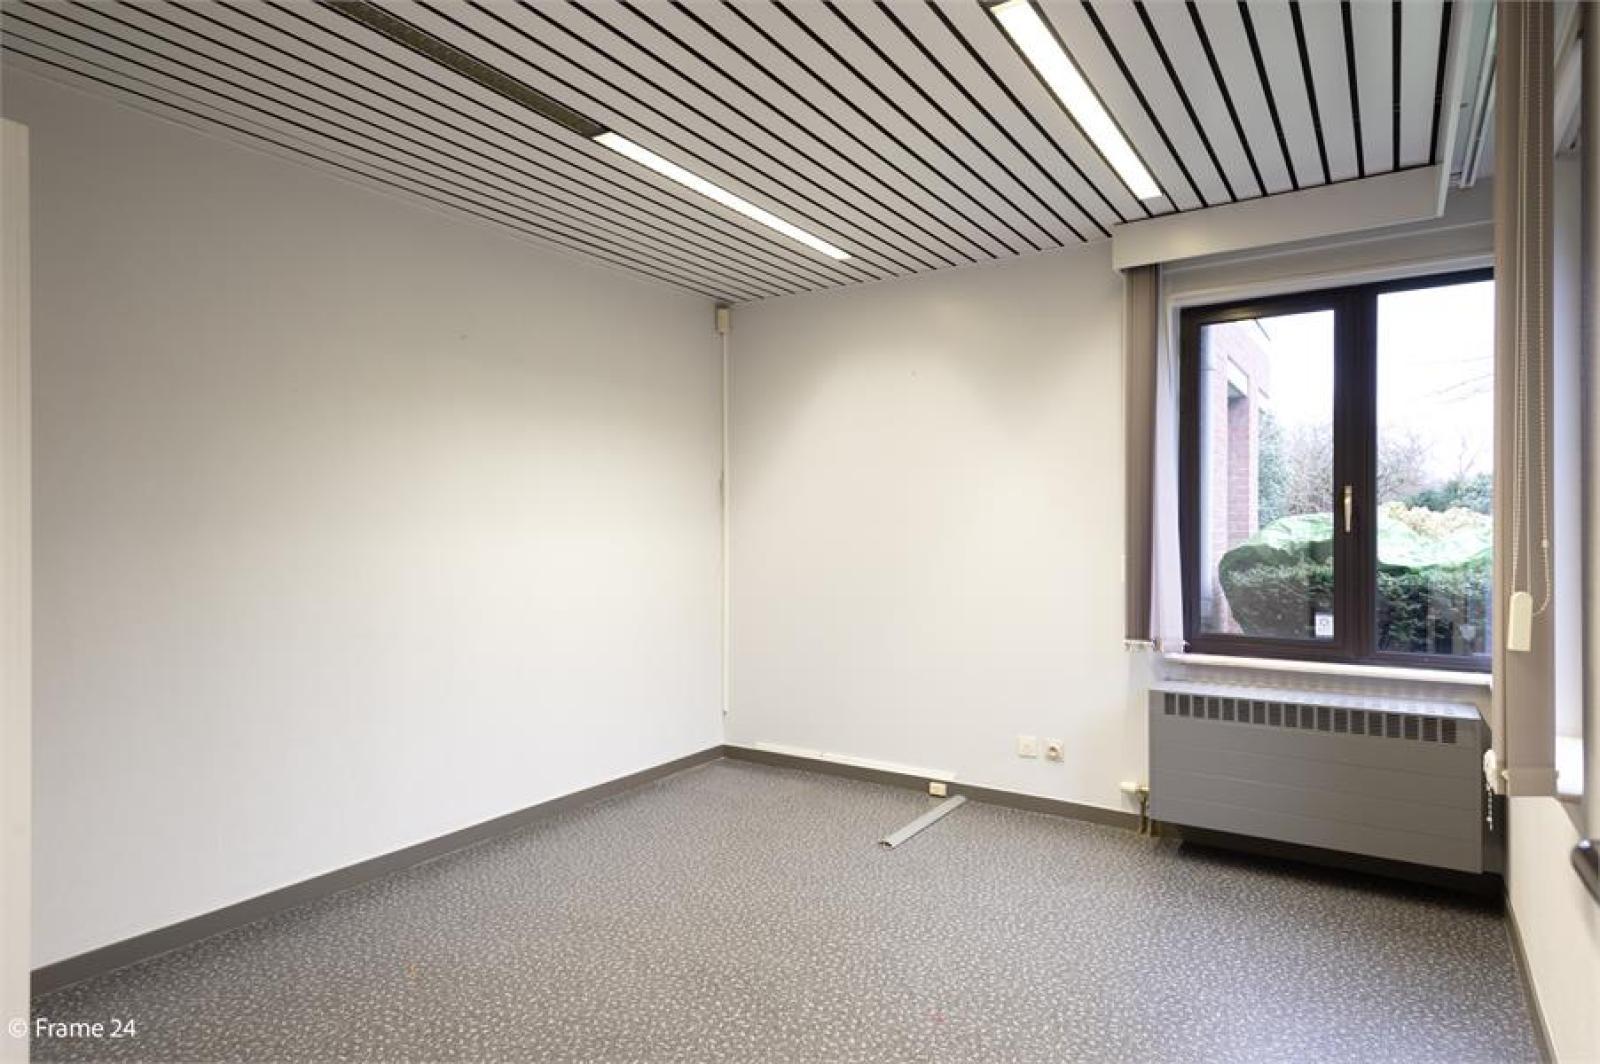 Handelsruimte met riante triplex (200 m²) op centrale ligging te Edegem! afbeelding 7